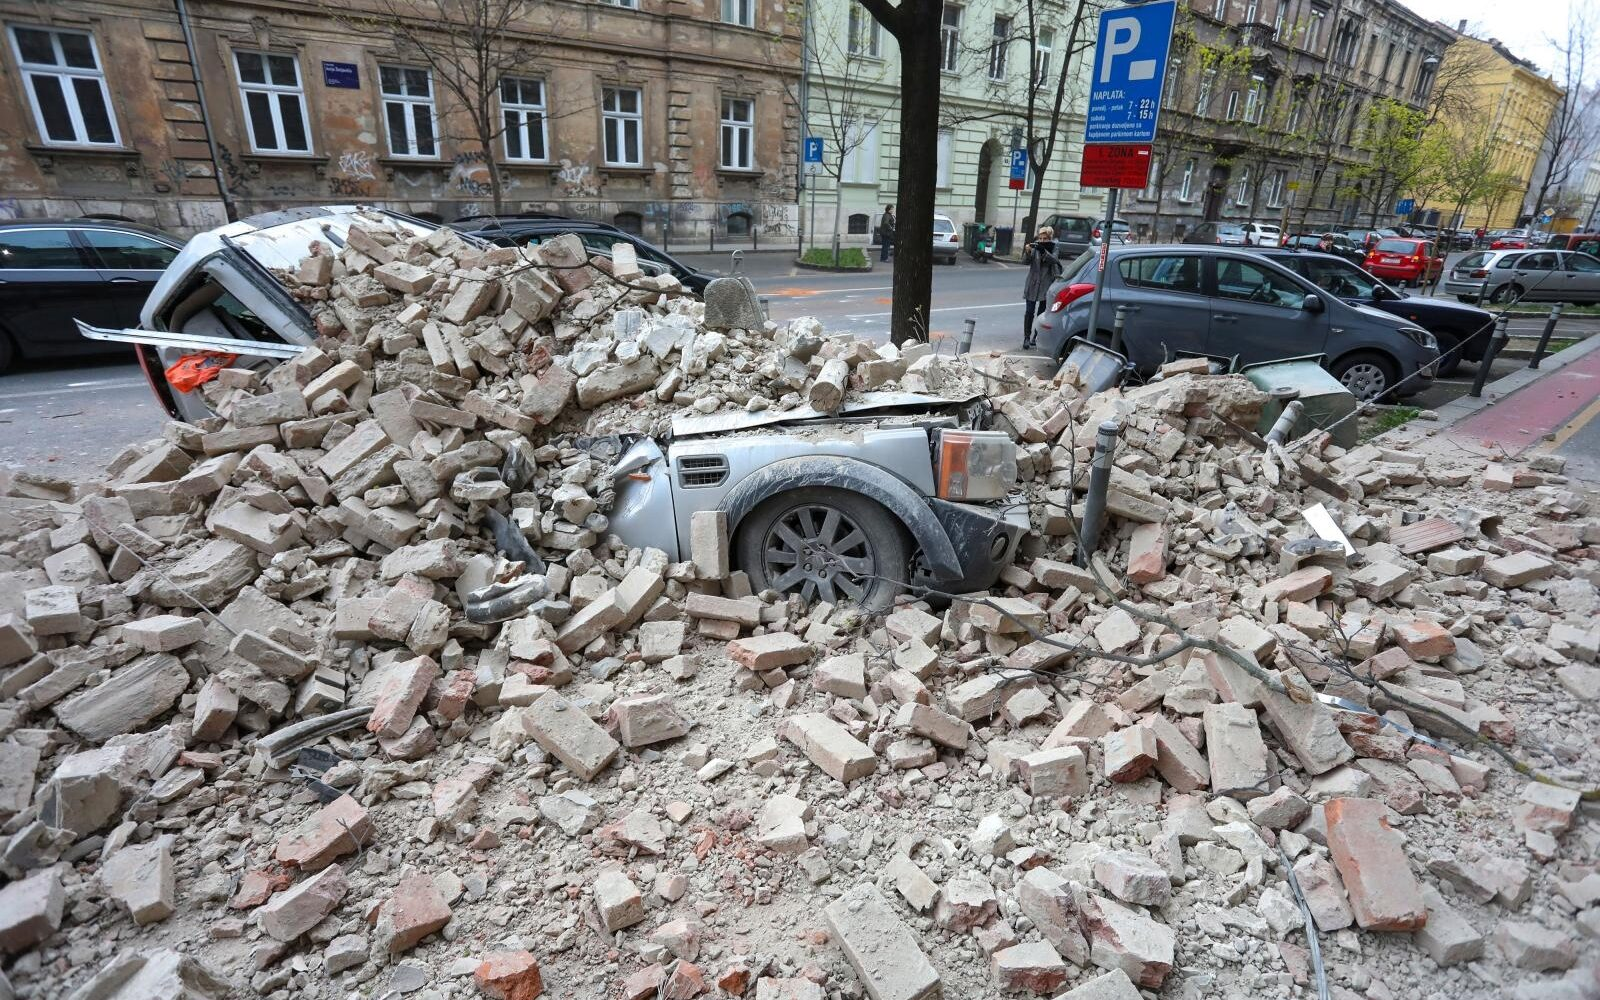 FOTO: Snažni potresi uzdrmali Zagreb, oštećene zgrade, dijete ...